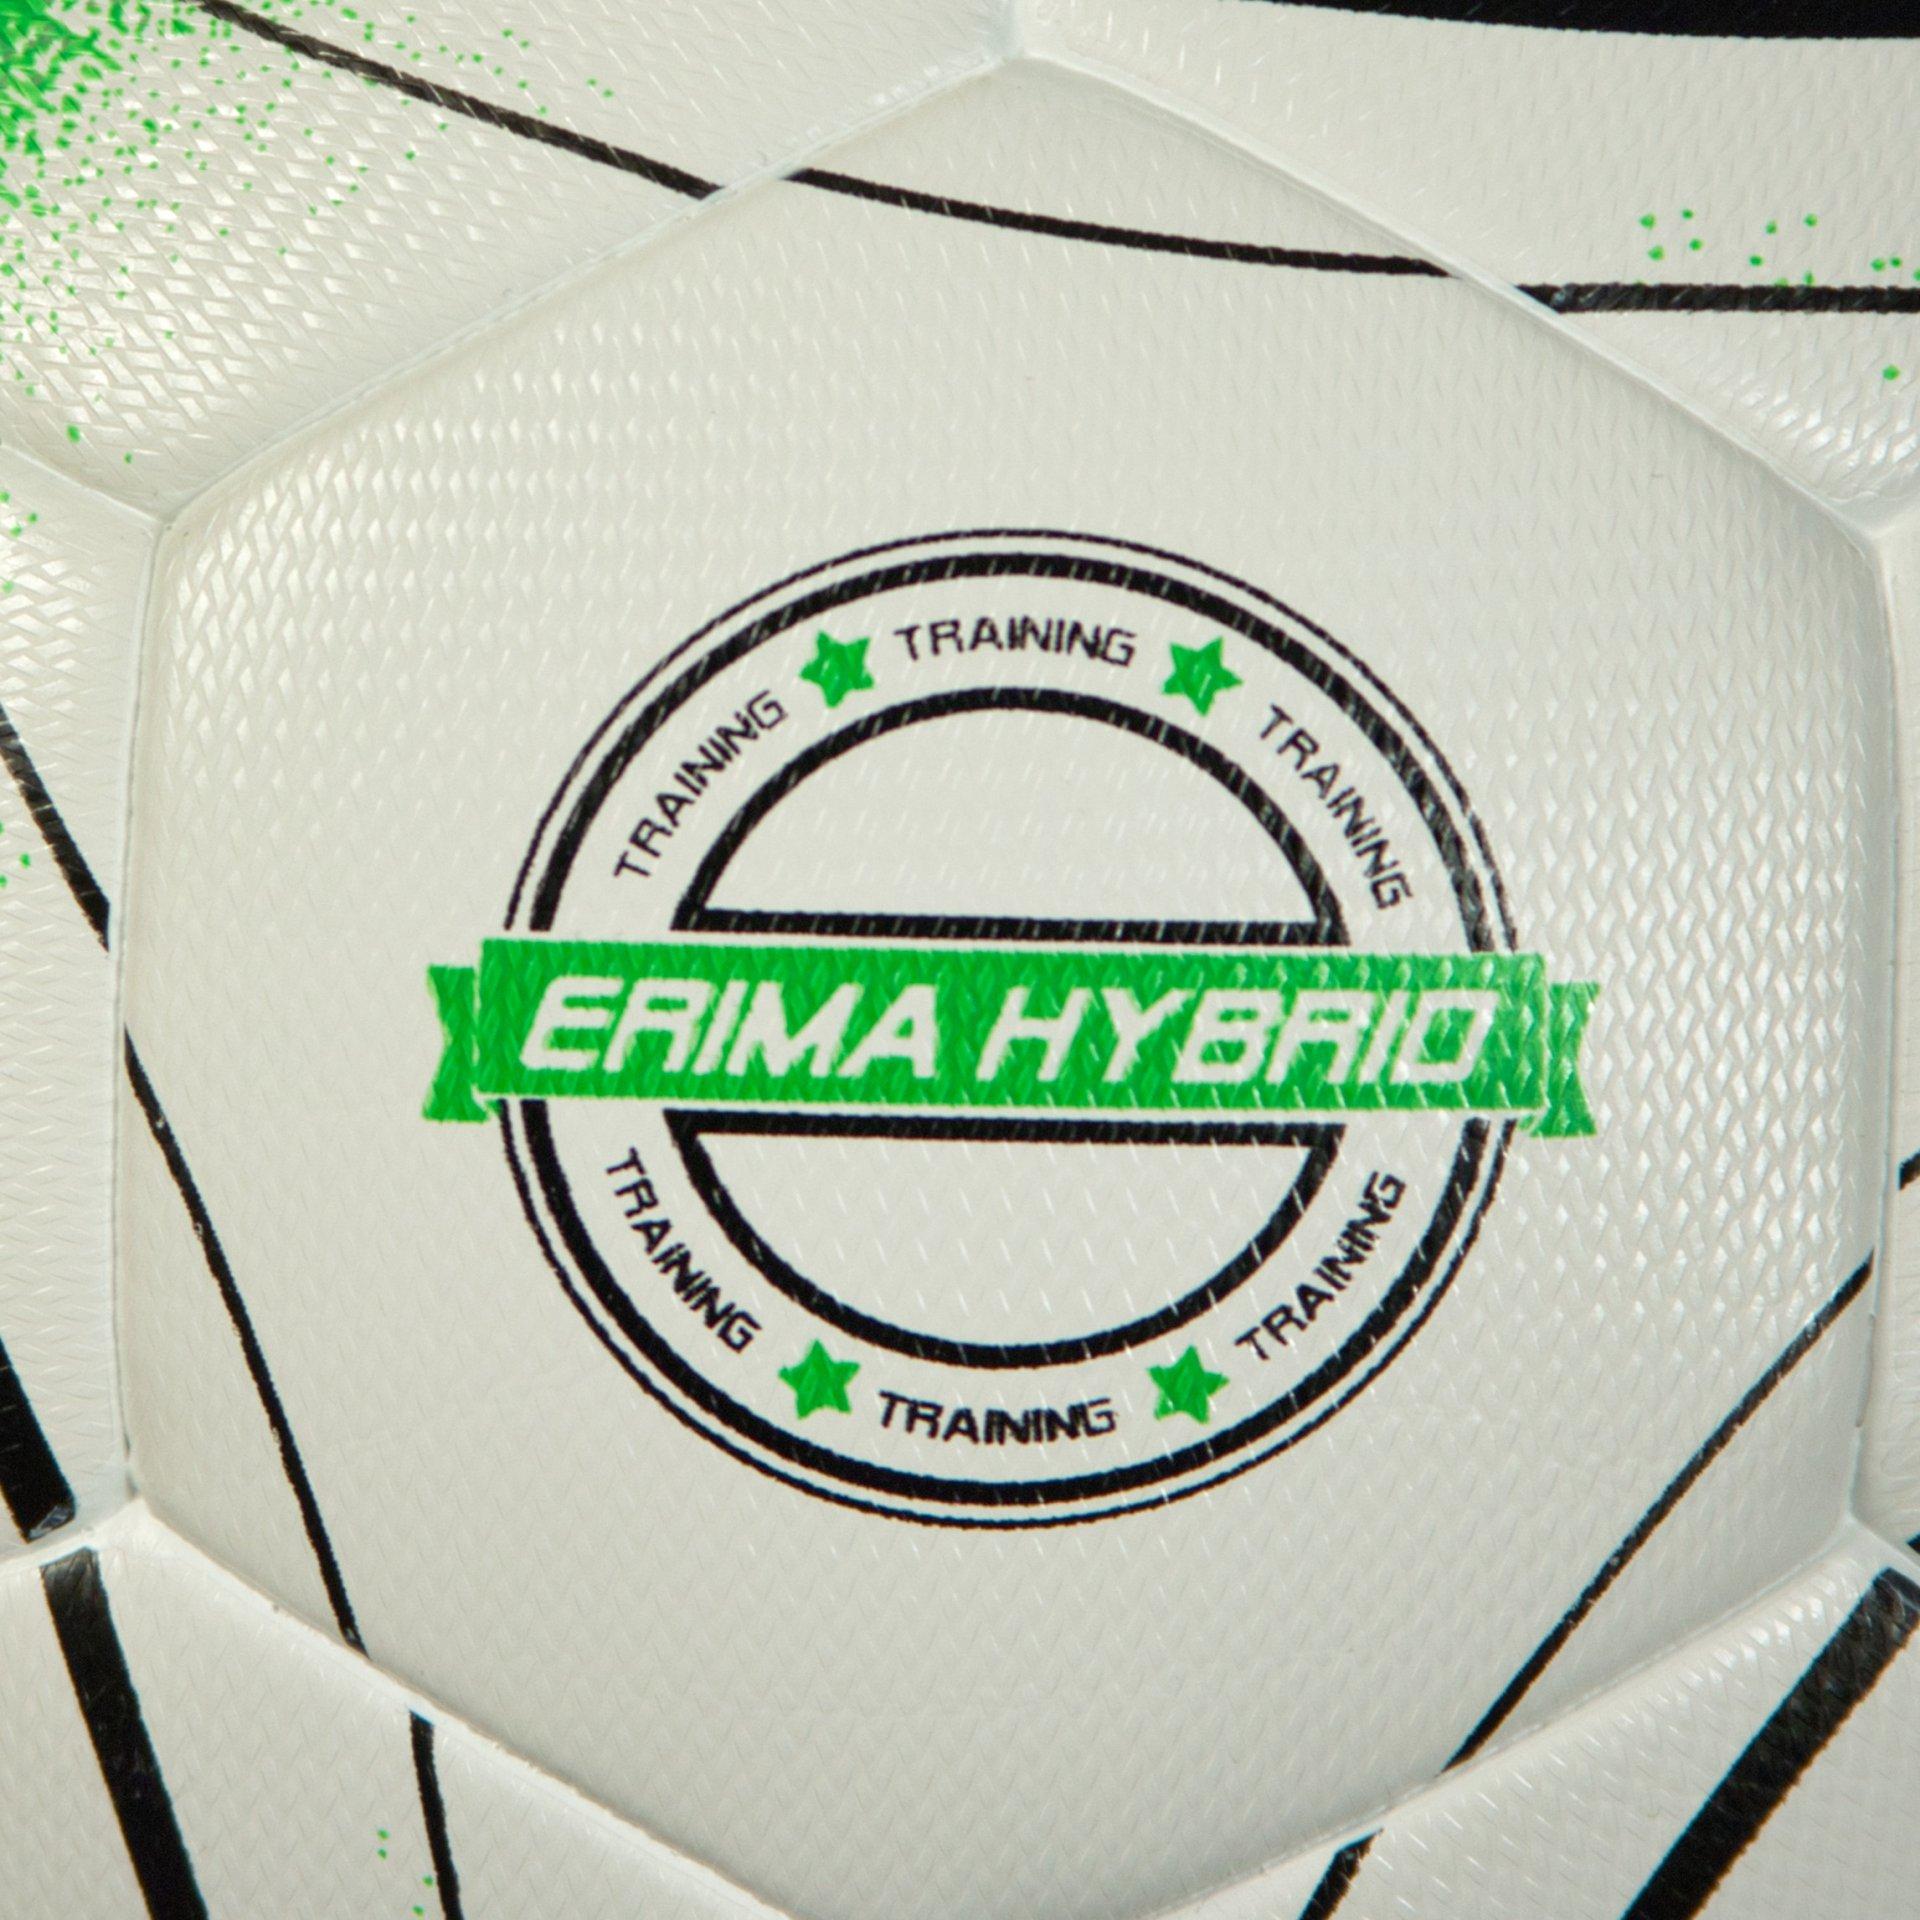 Erima Hybrid Training Siegel